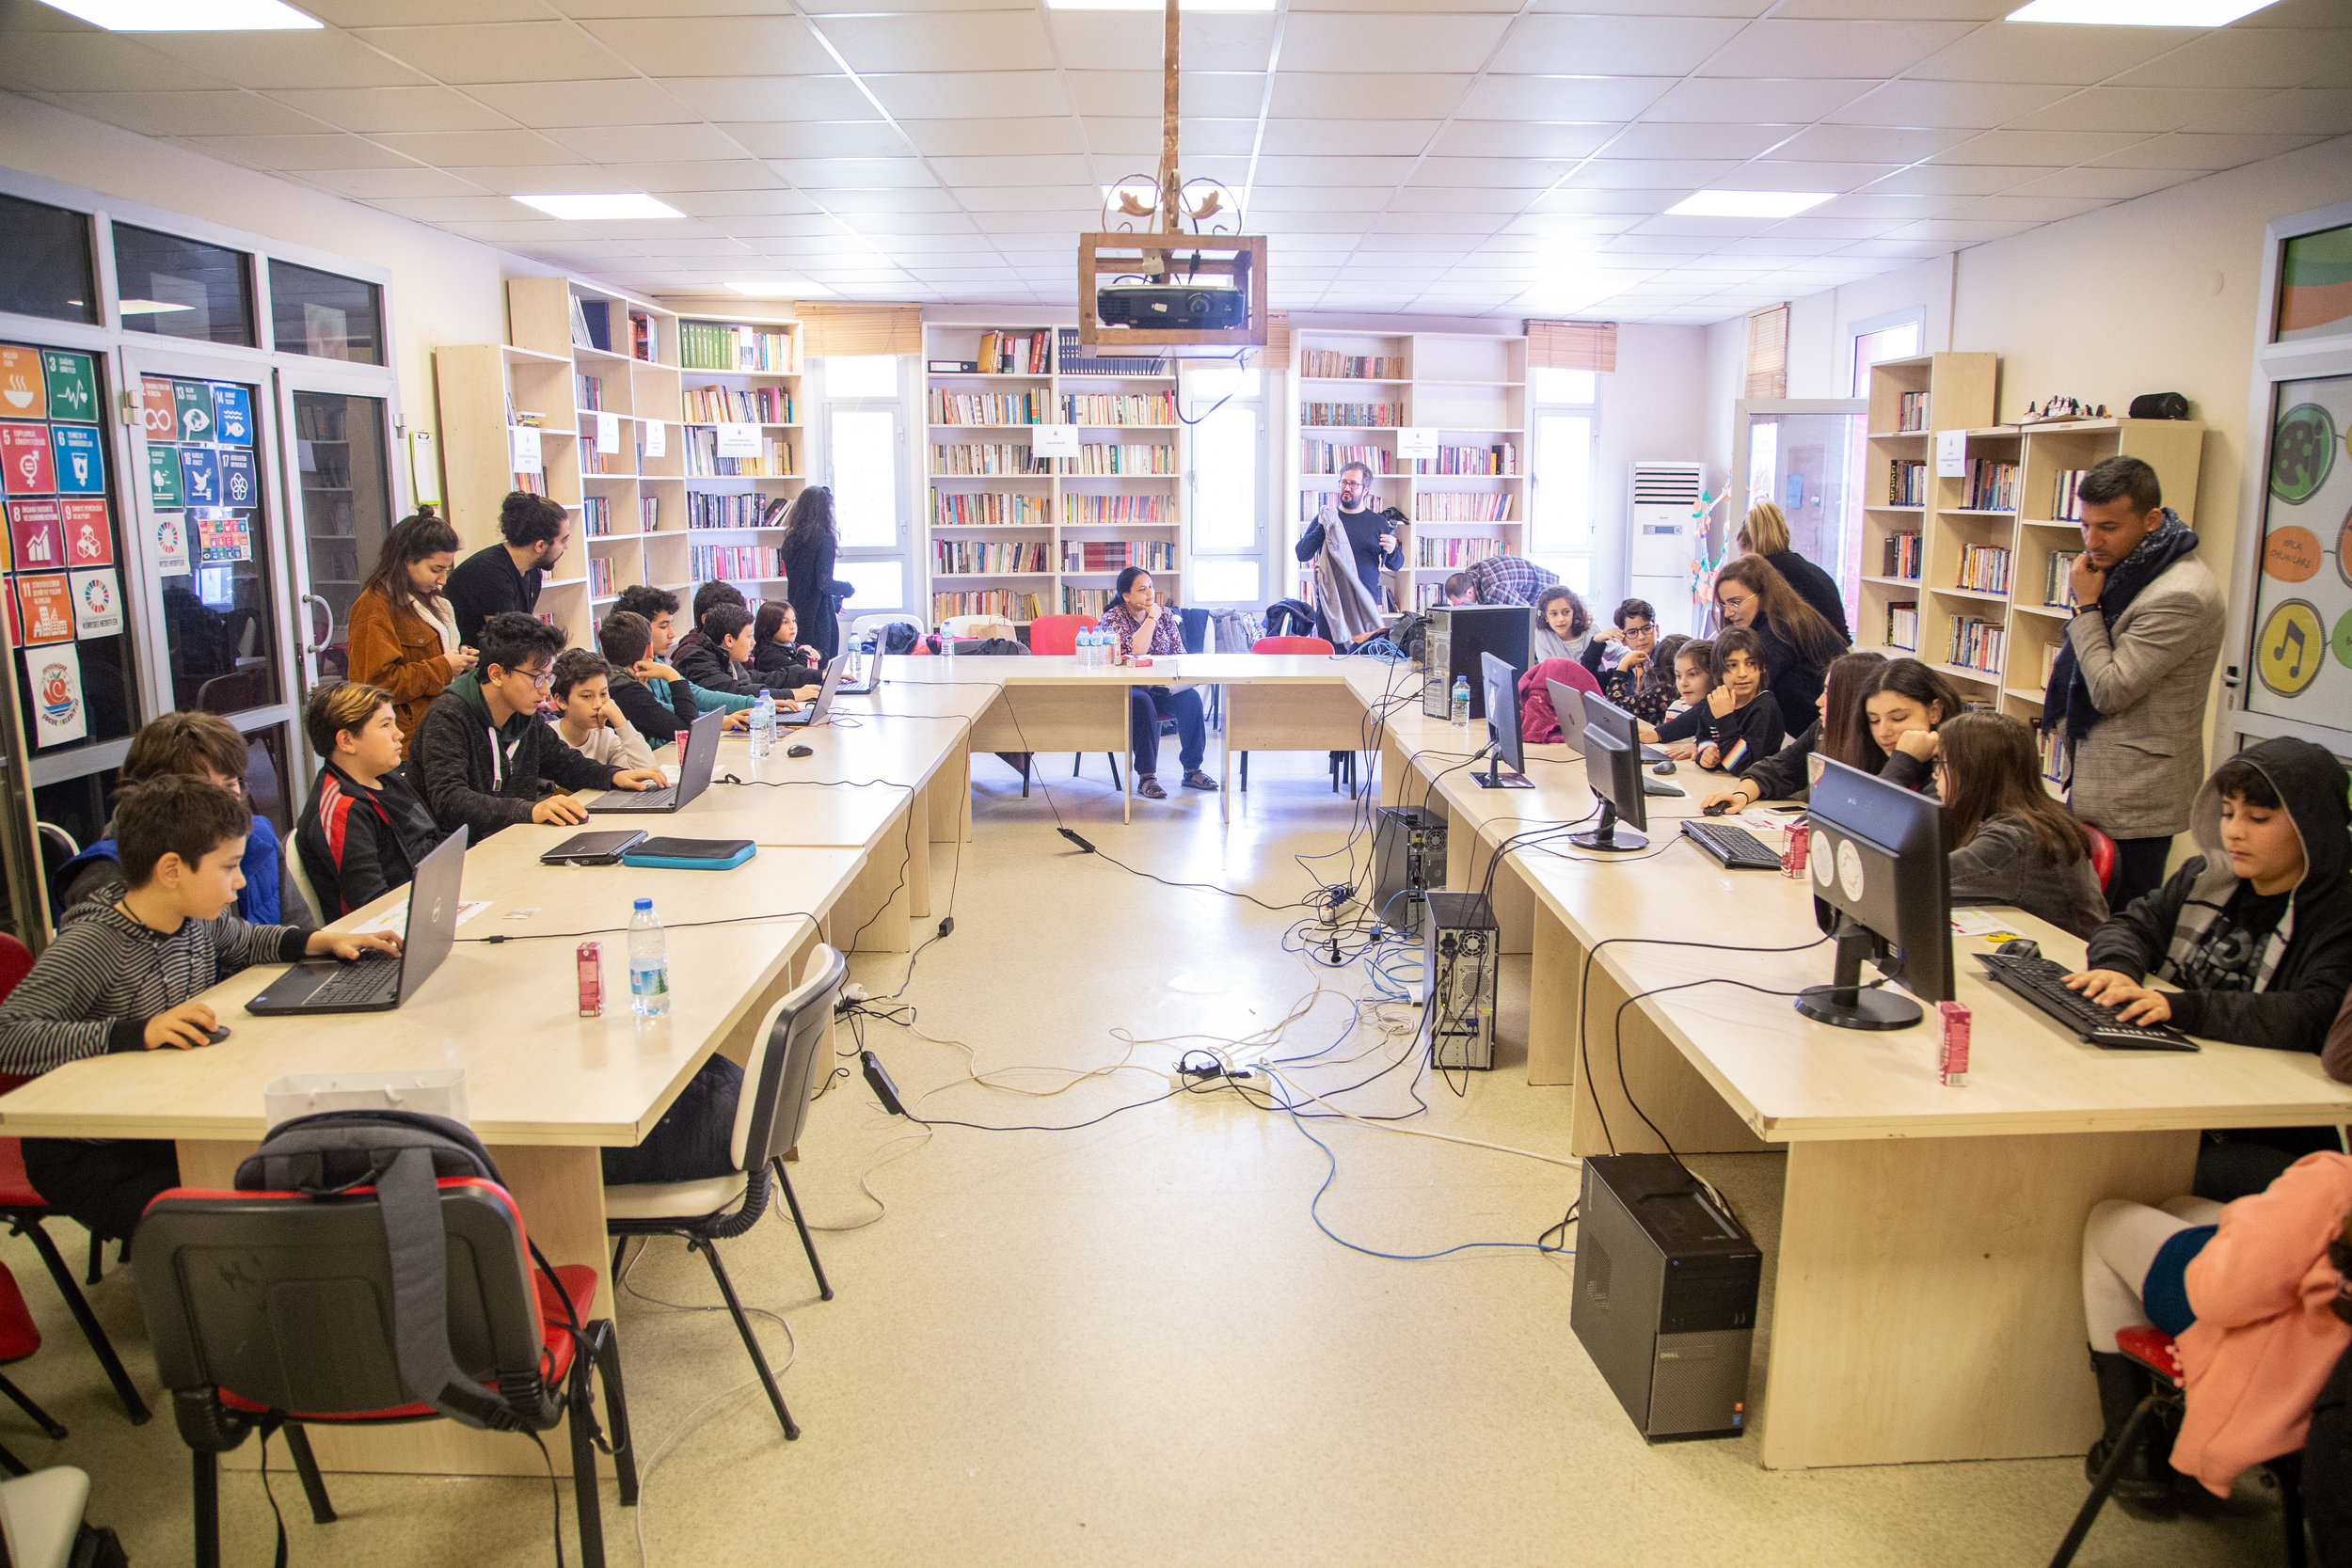 Creativity in action at the Seferihisar Block by Block Workshop. Credit: UN-Habitat